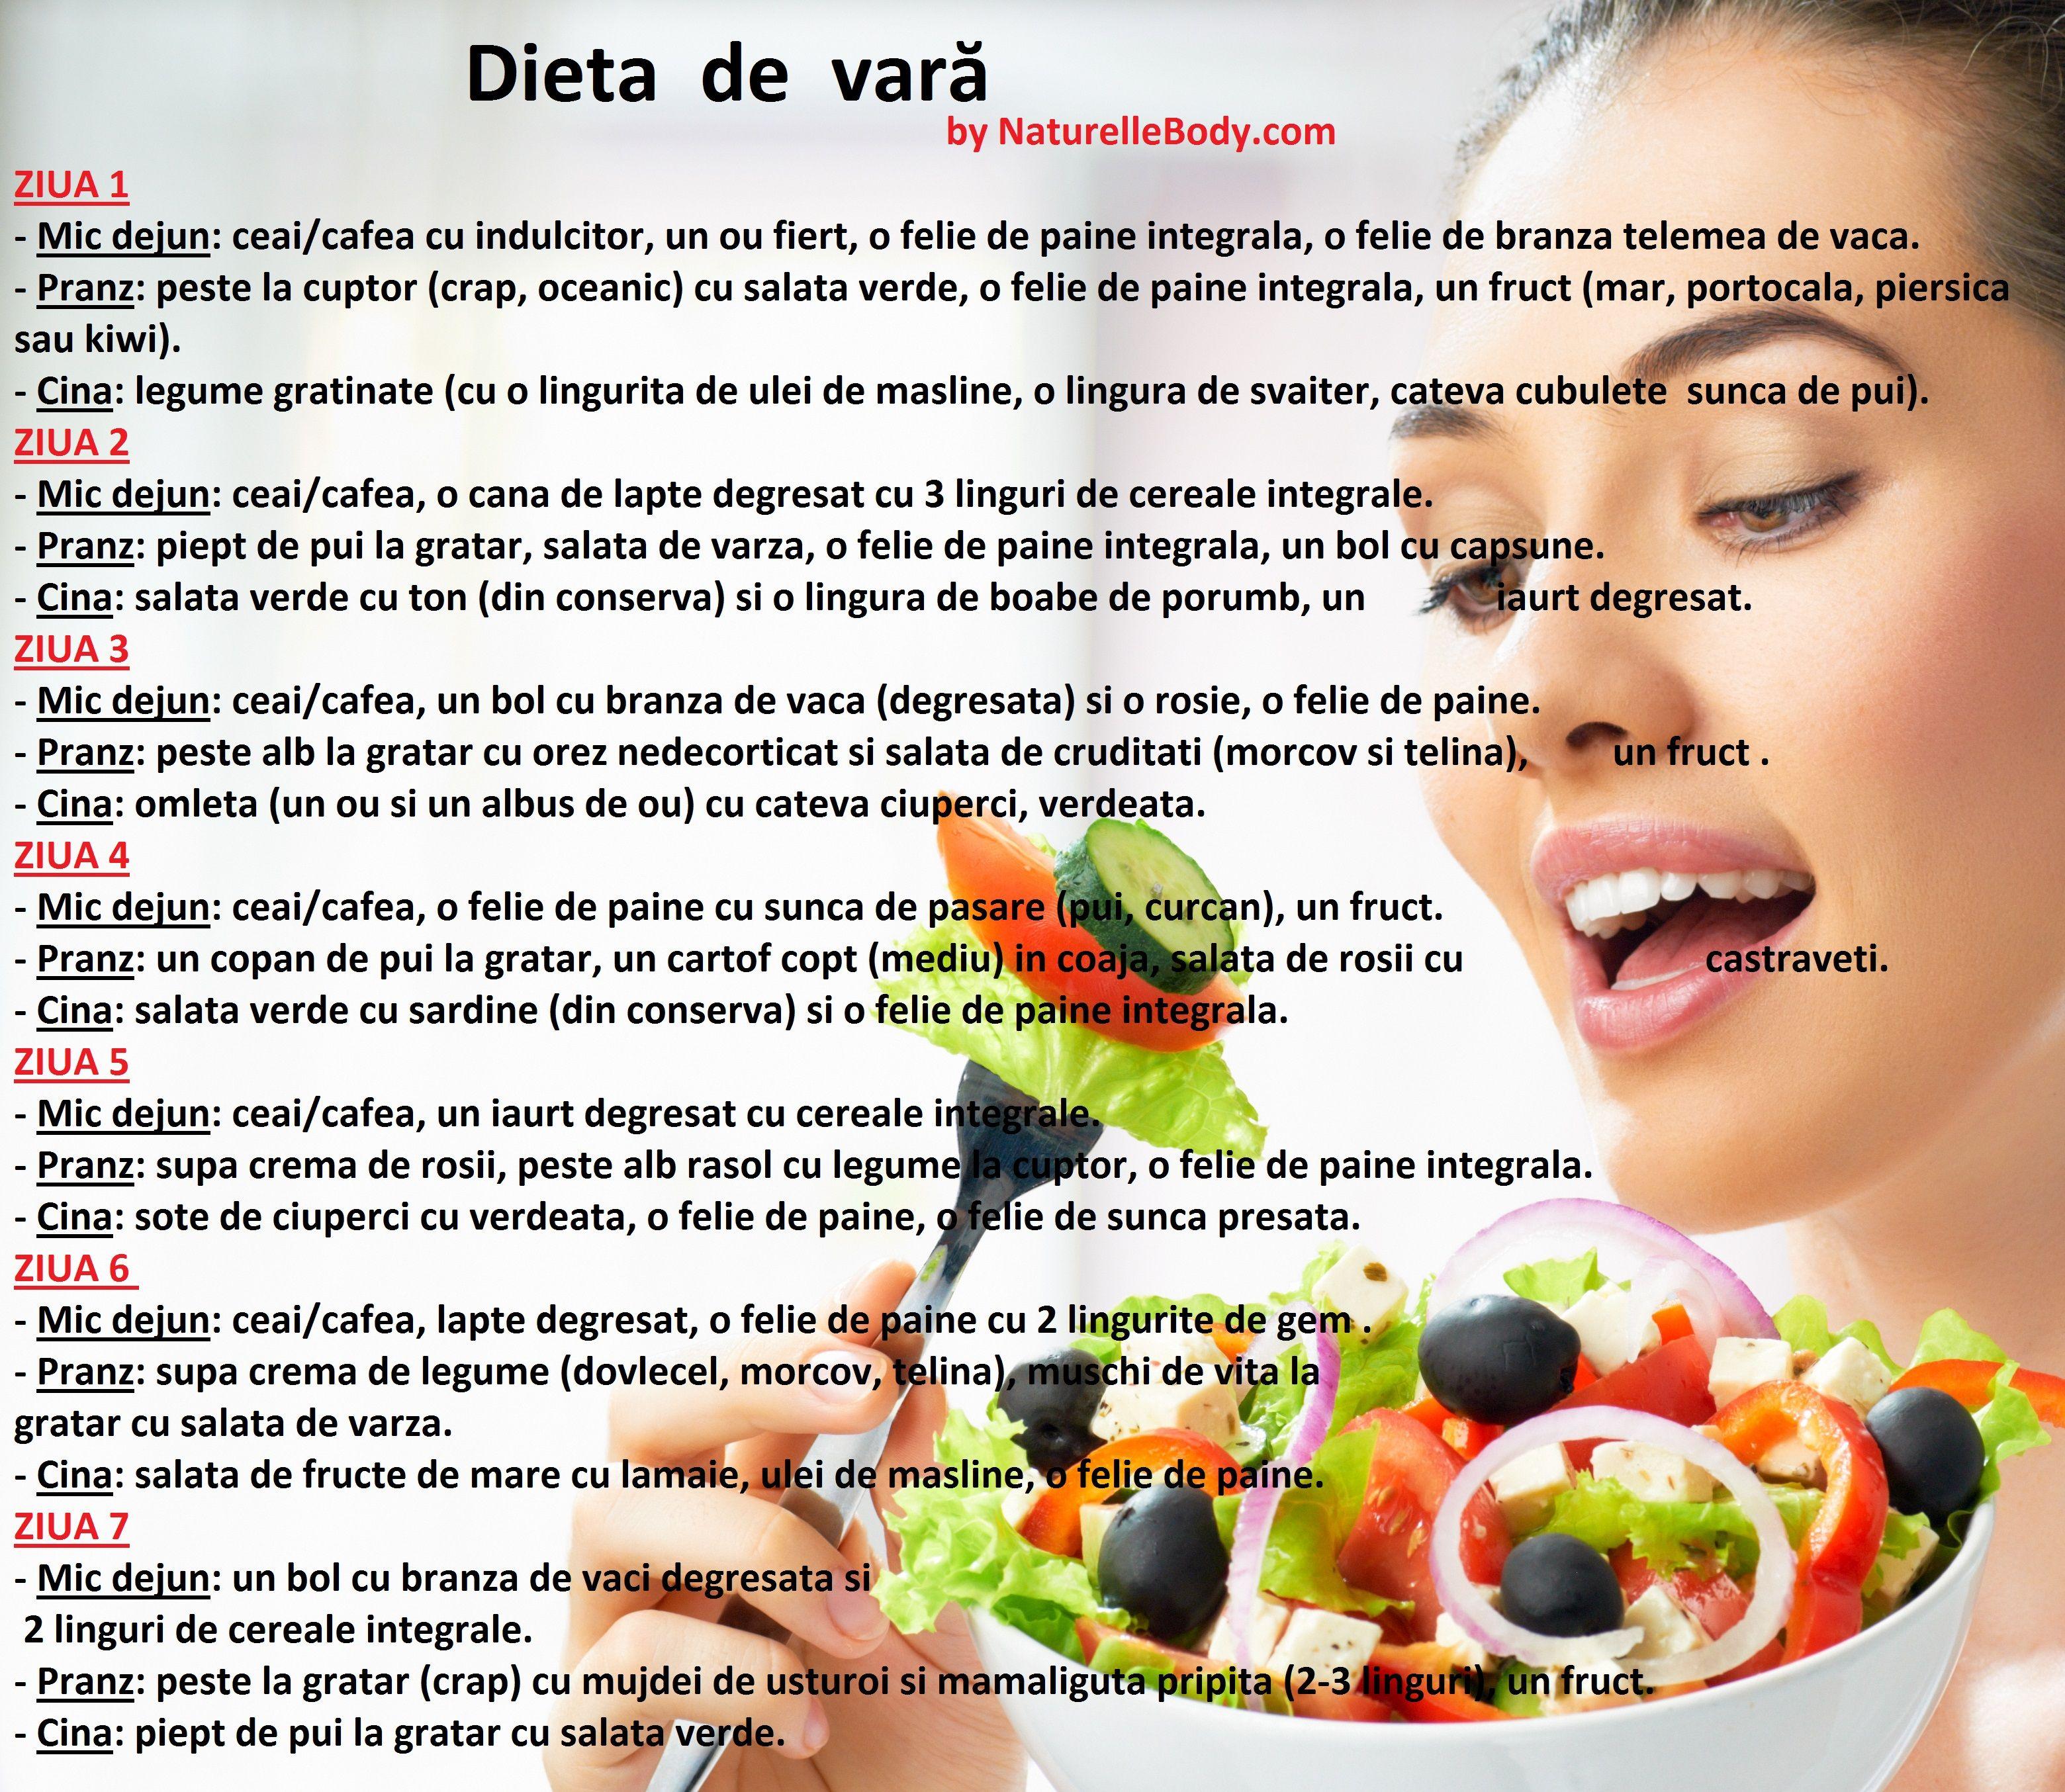 Dieta de vara expres: Meniul complet care te ajuta sa slabesti in timp-record! - bijuterieonline.ro